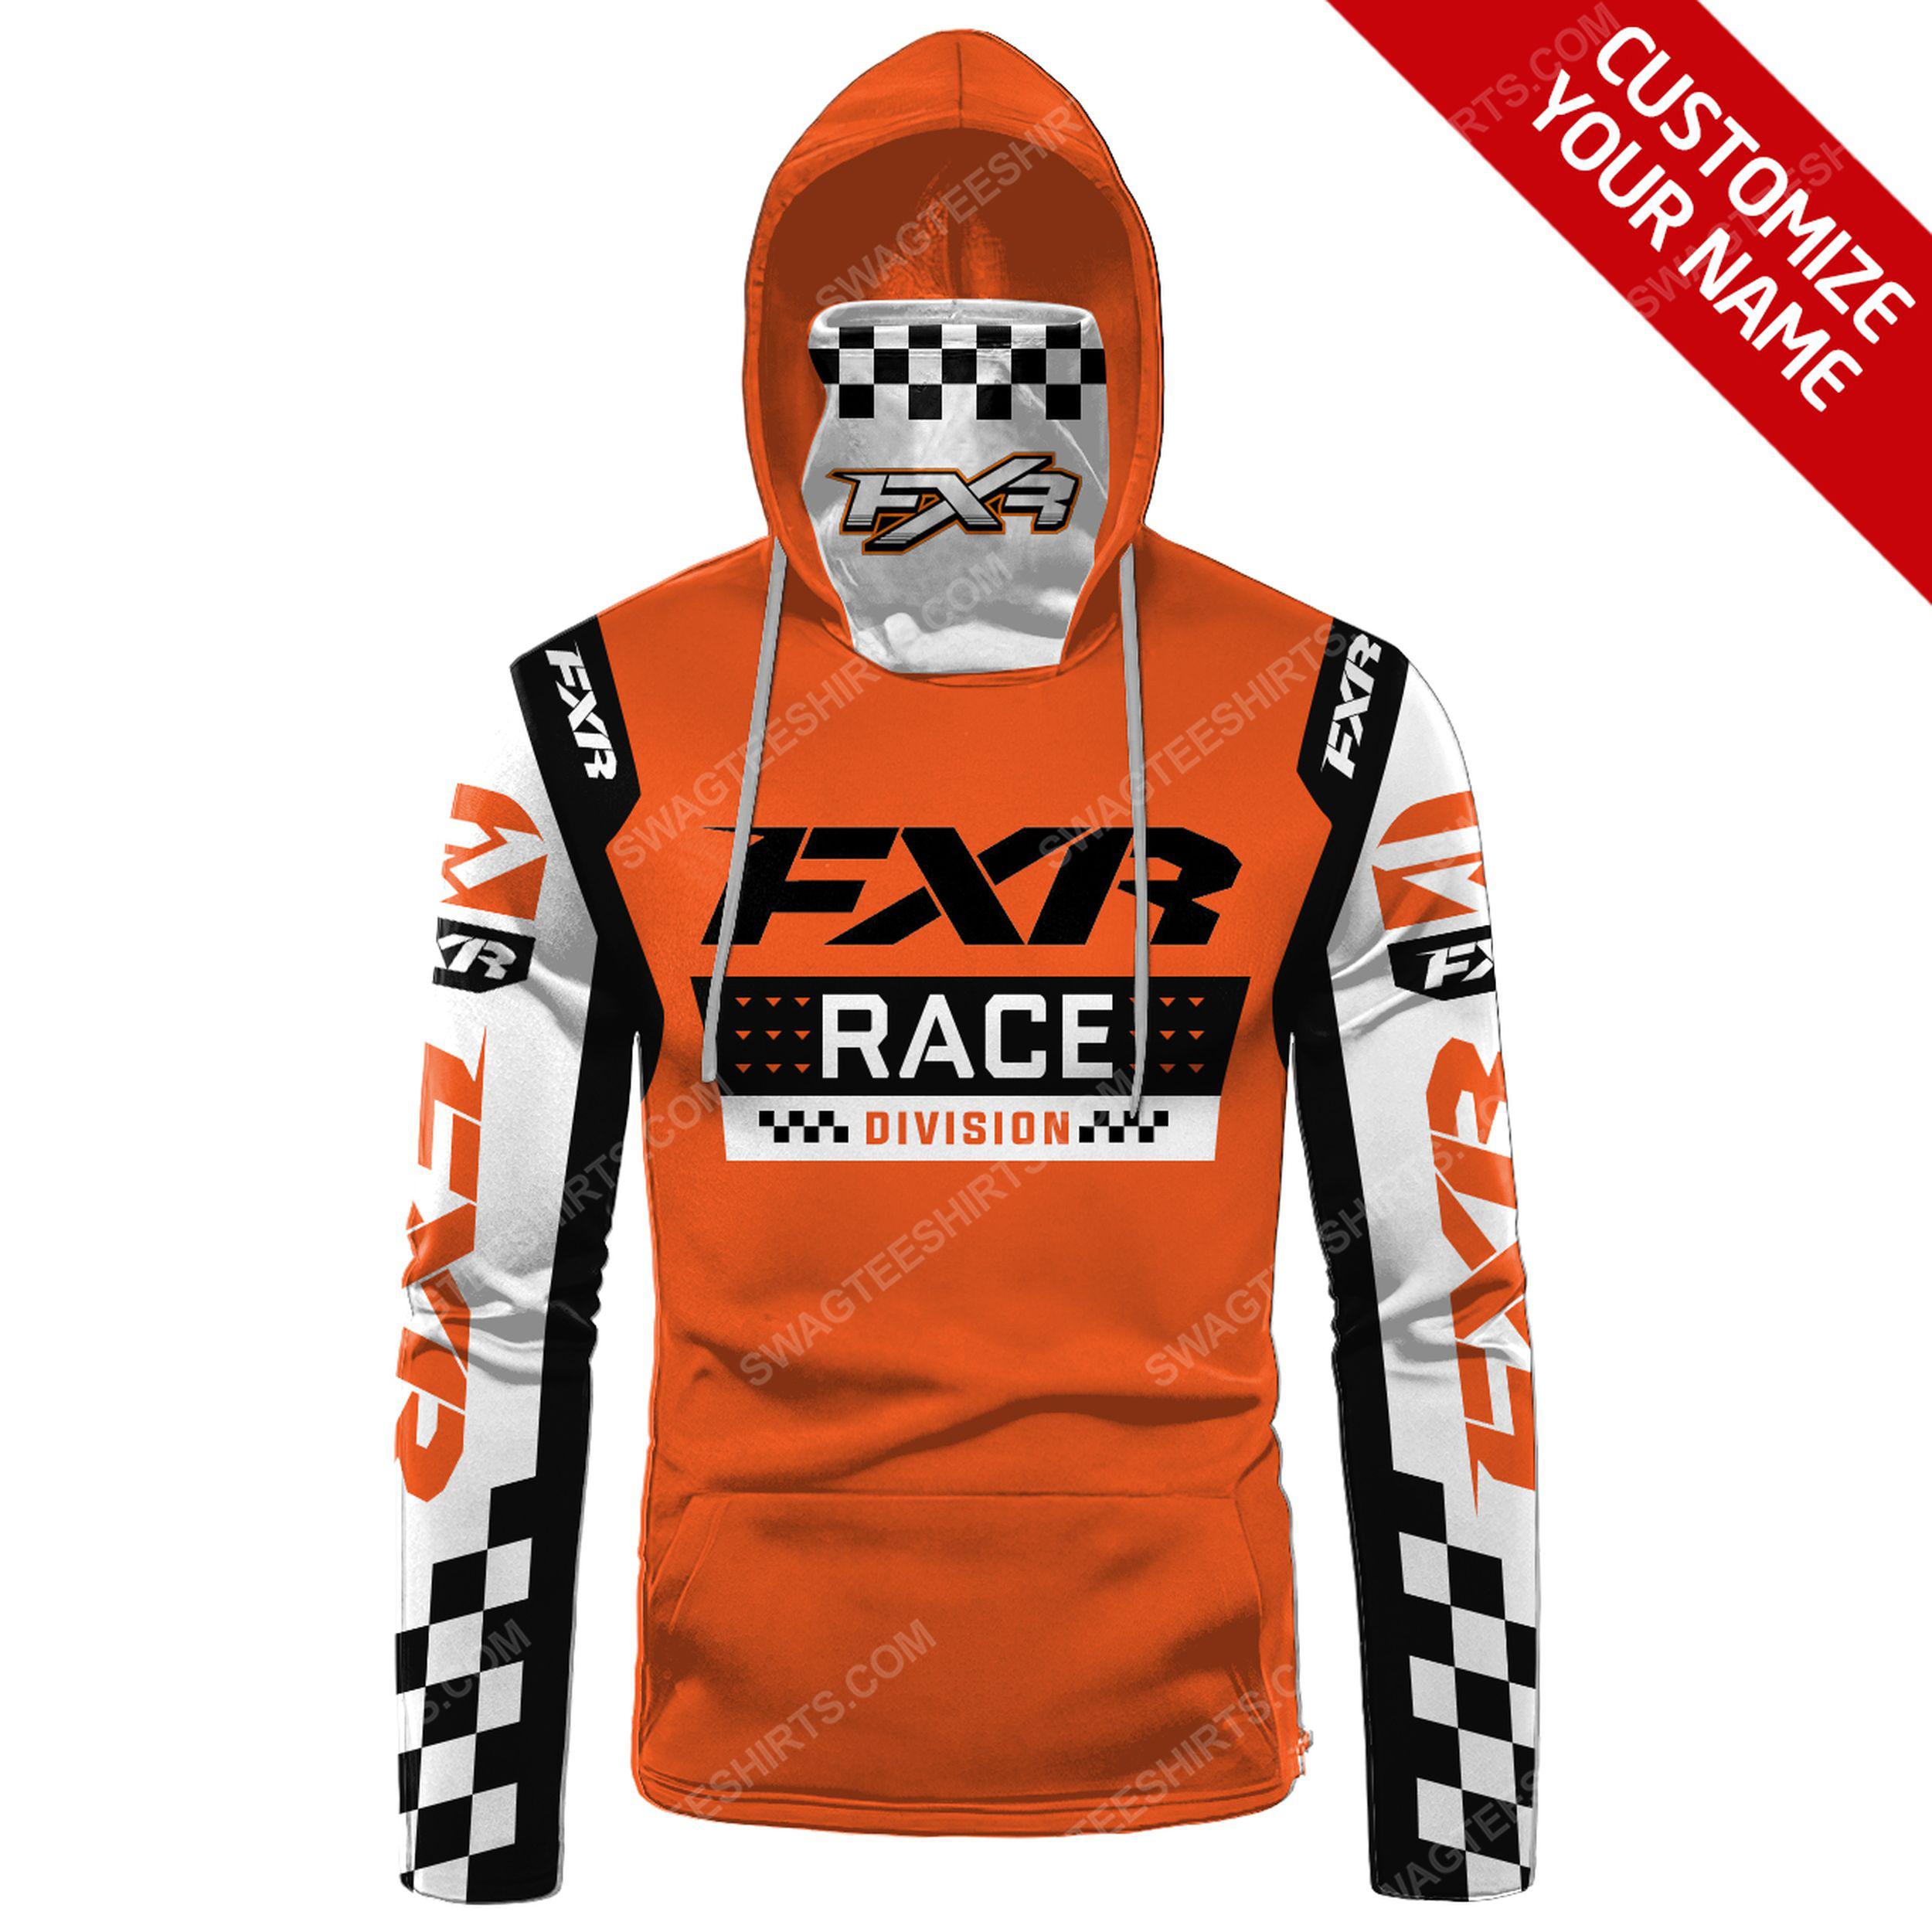 Custom name fxr race division full print mask hoodie 2(1) - Copy